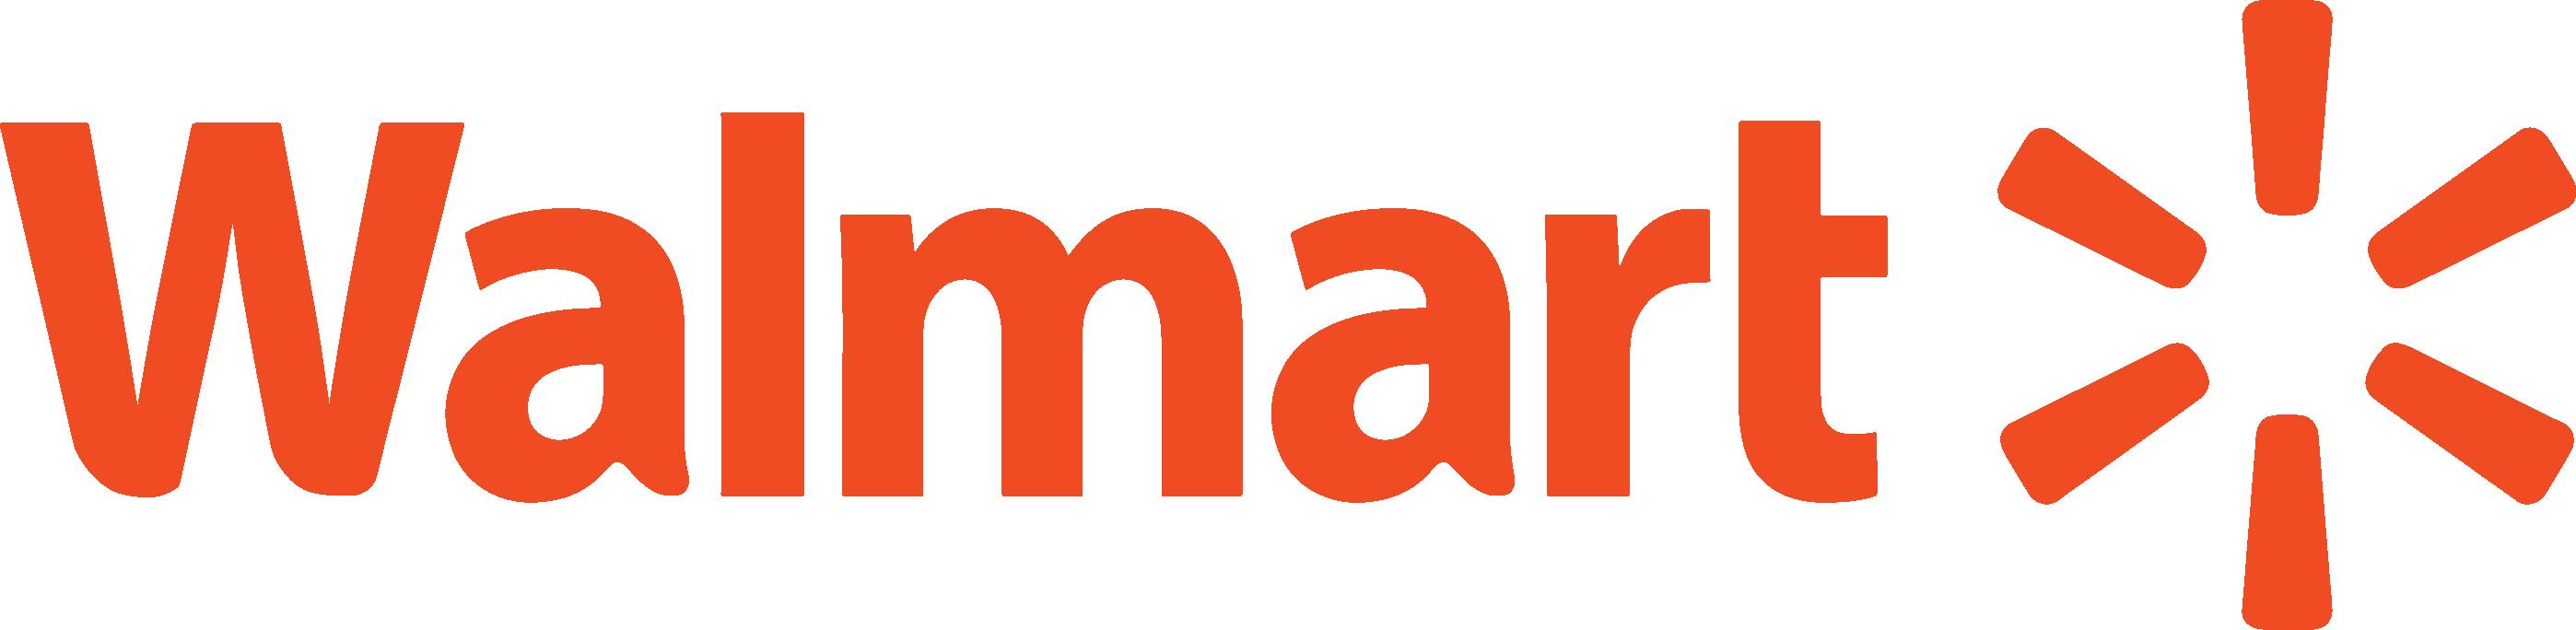 Walmart_Orange